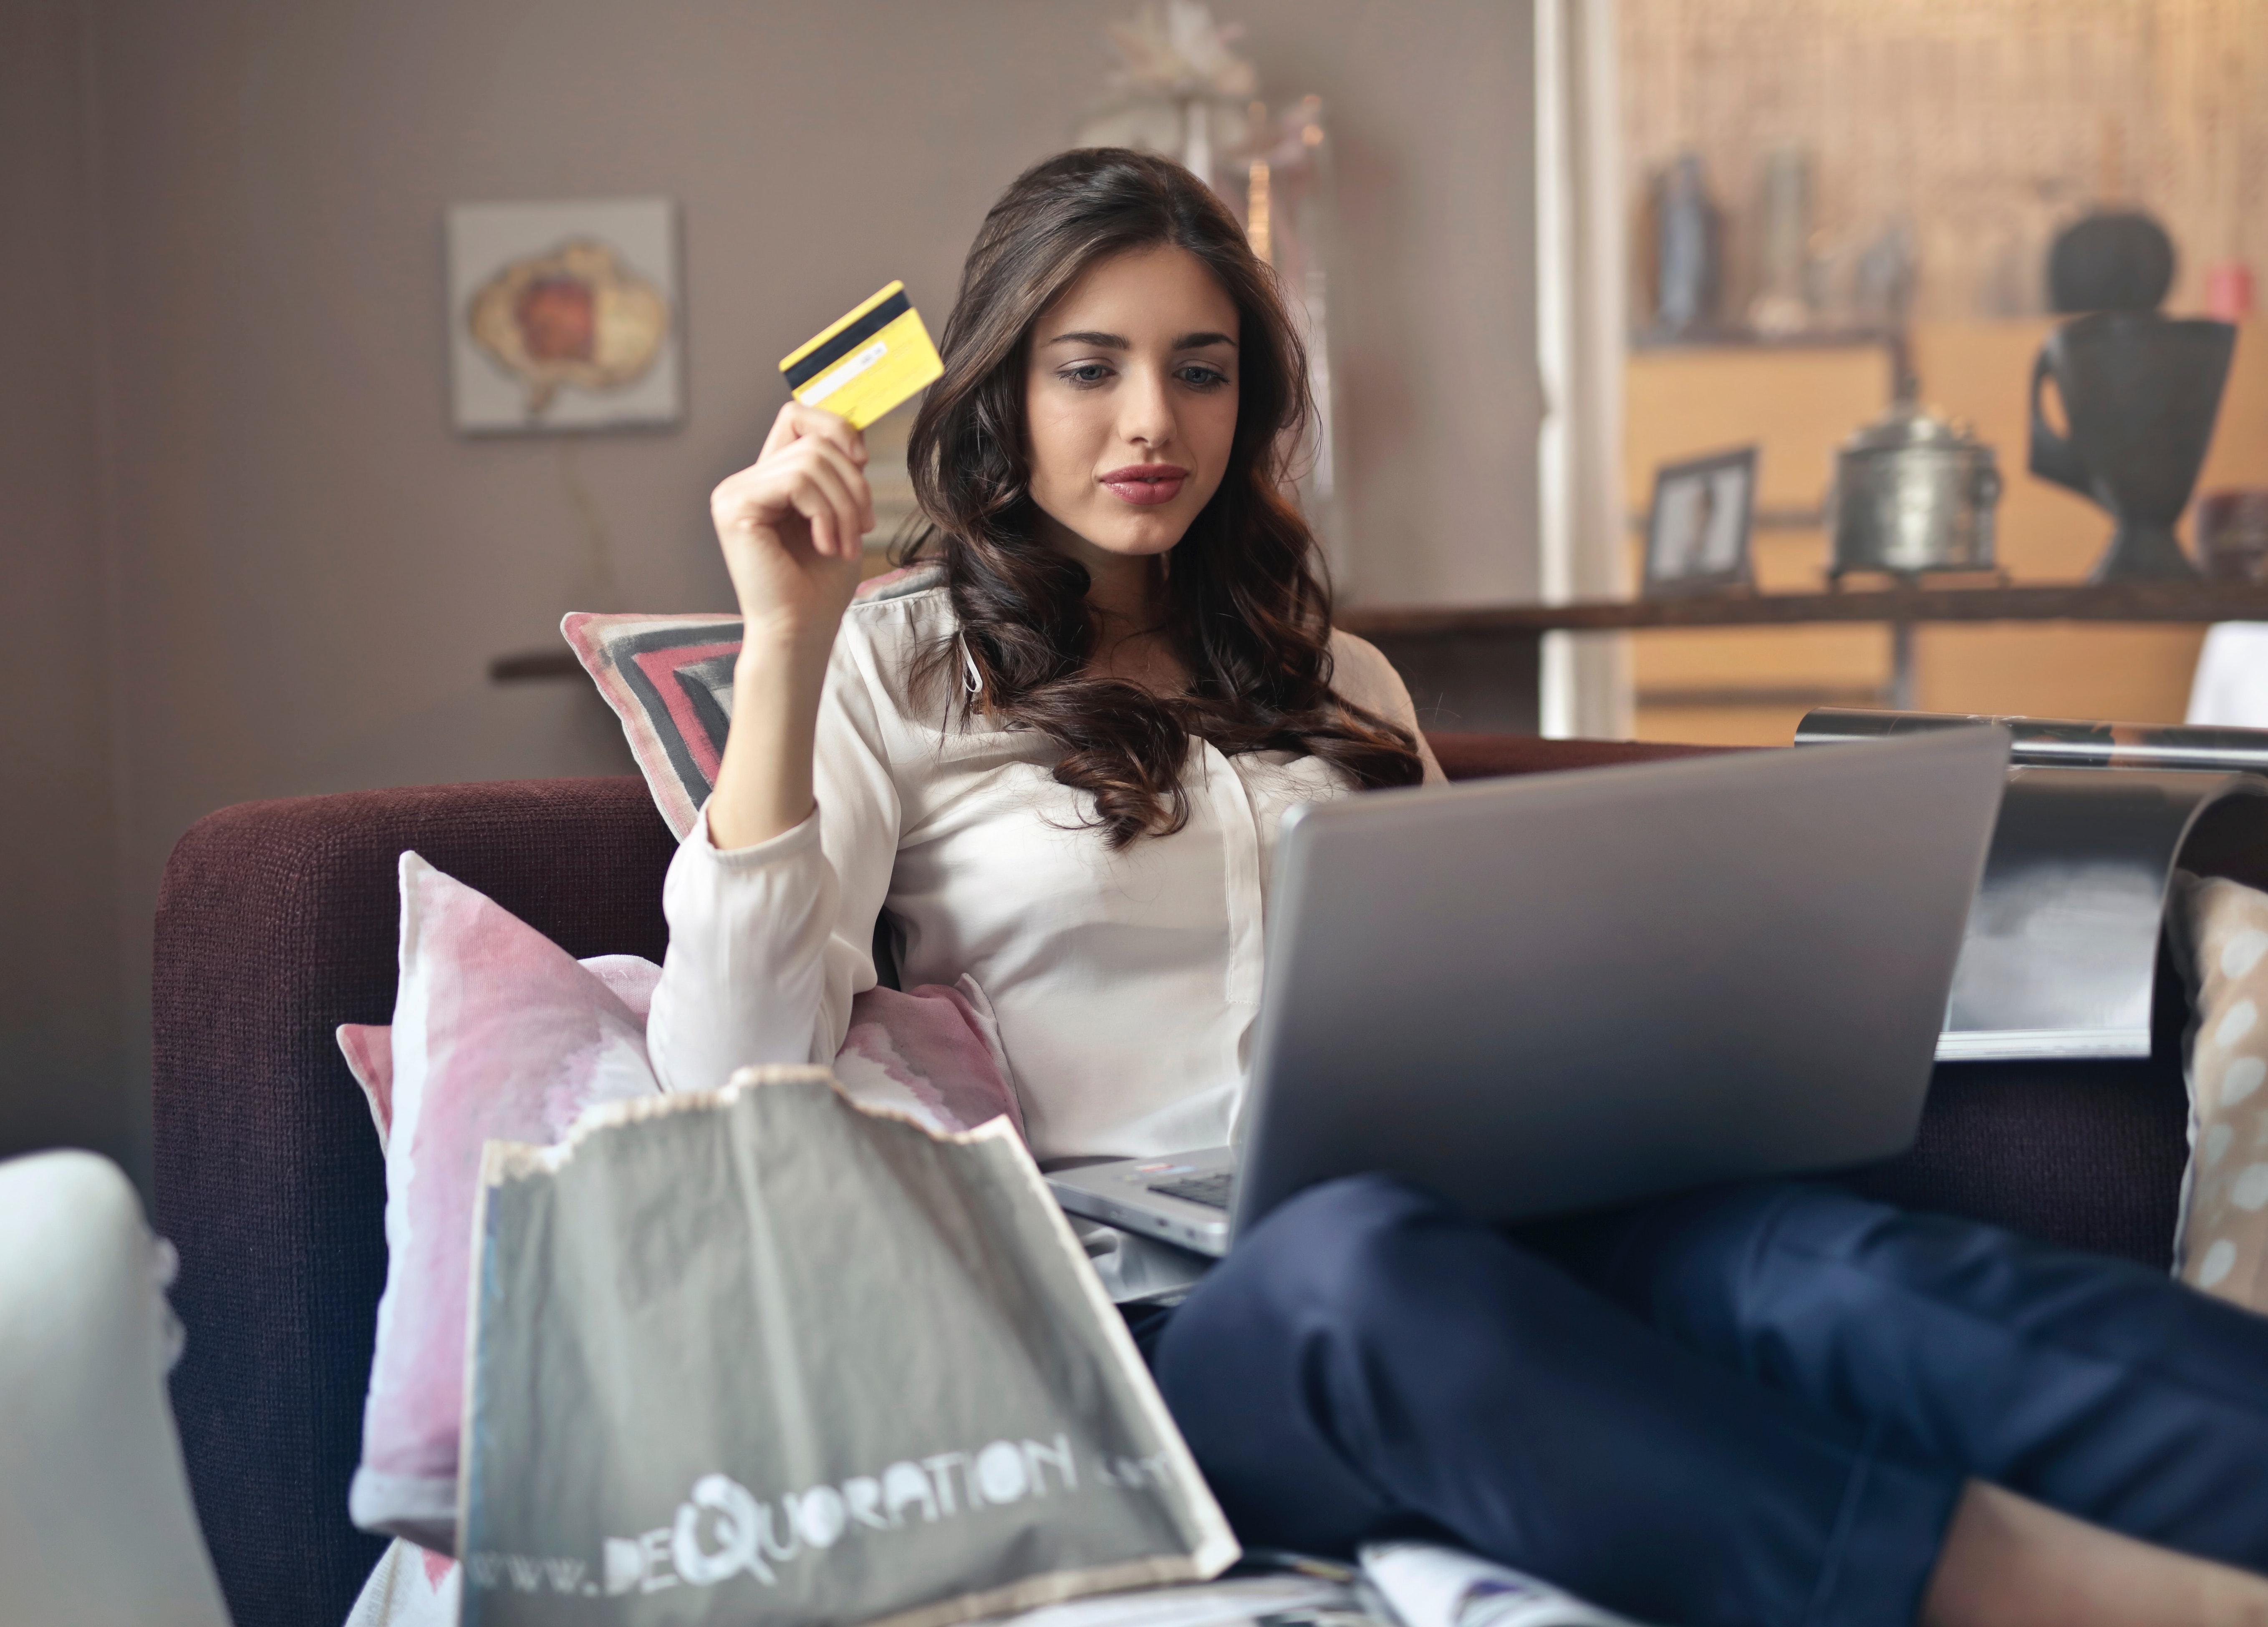 ropo ecommerce - kupowanie online